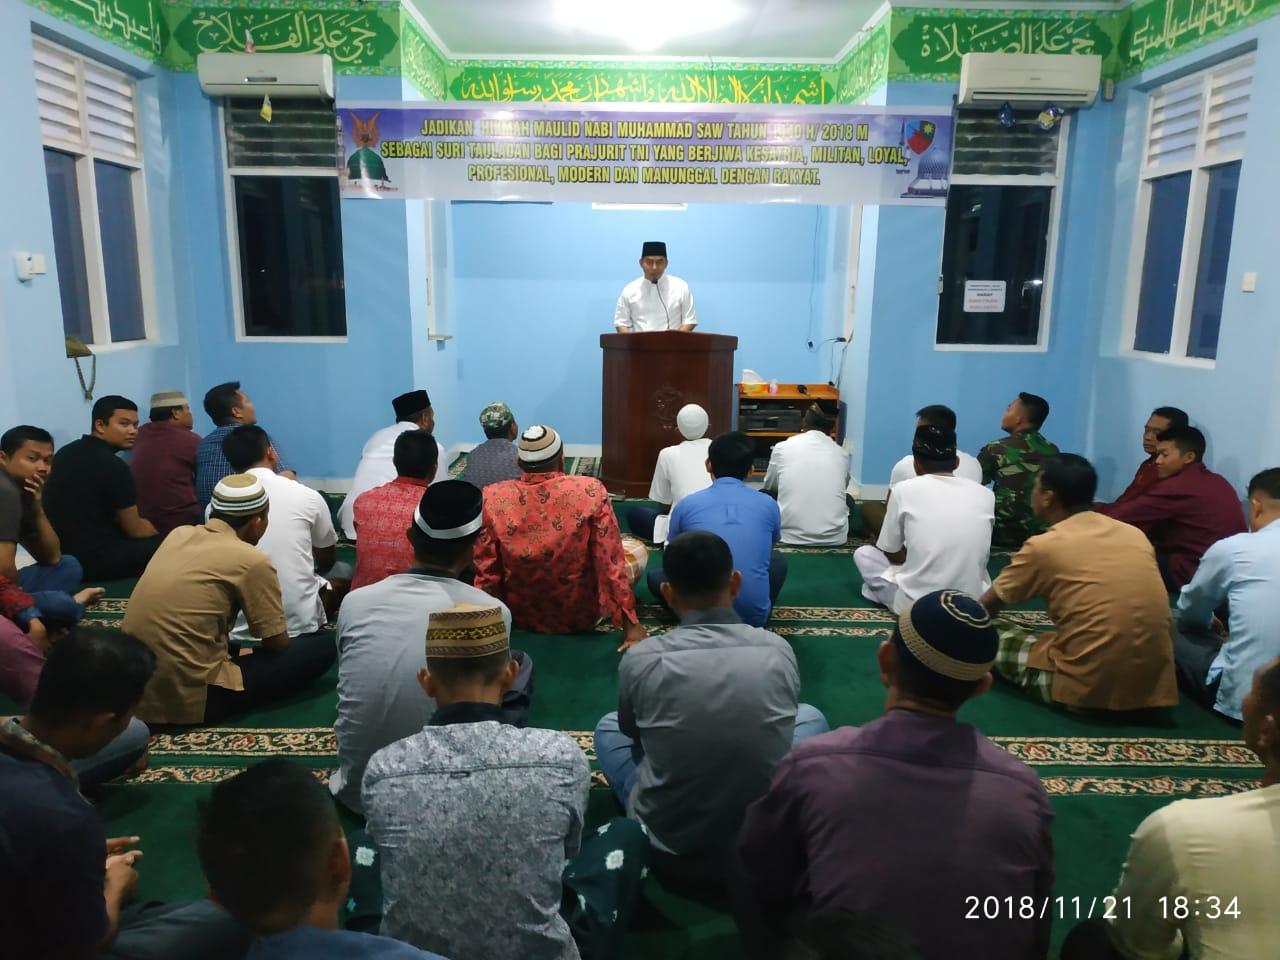 Lanud Yohanis Kapiyau Peringati Maulid Nabi Muhammad SAW 1440 H